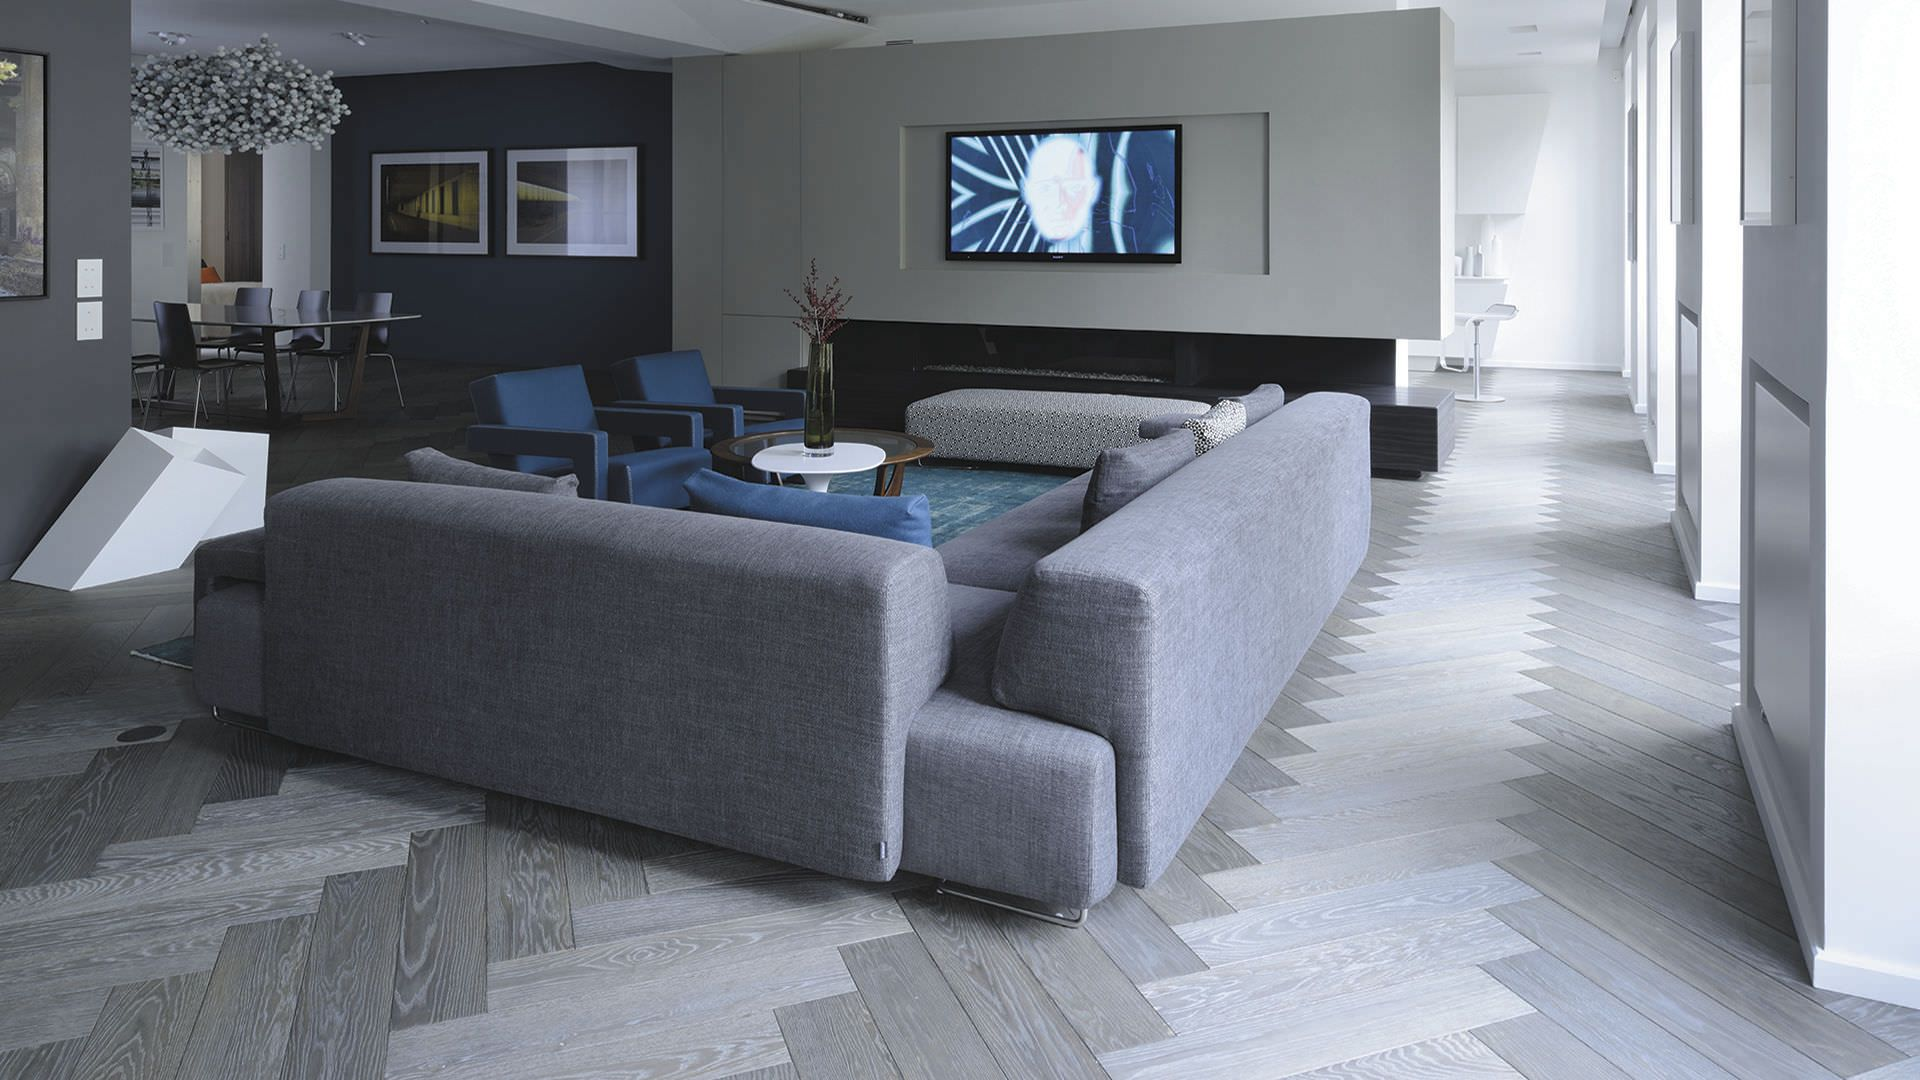 Storm inspired grey and blue living room. Herringbone